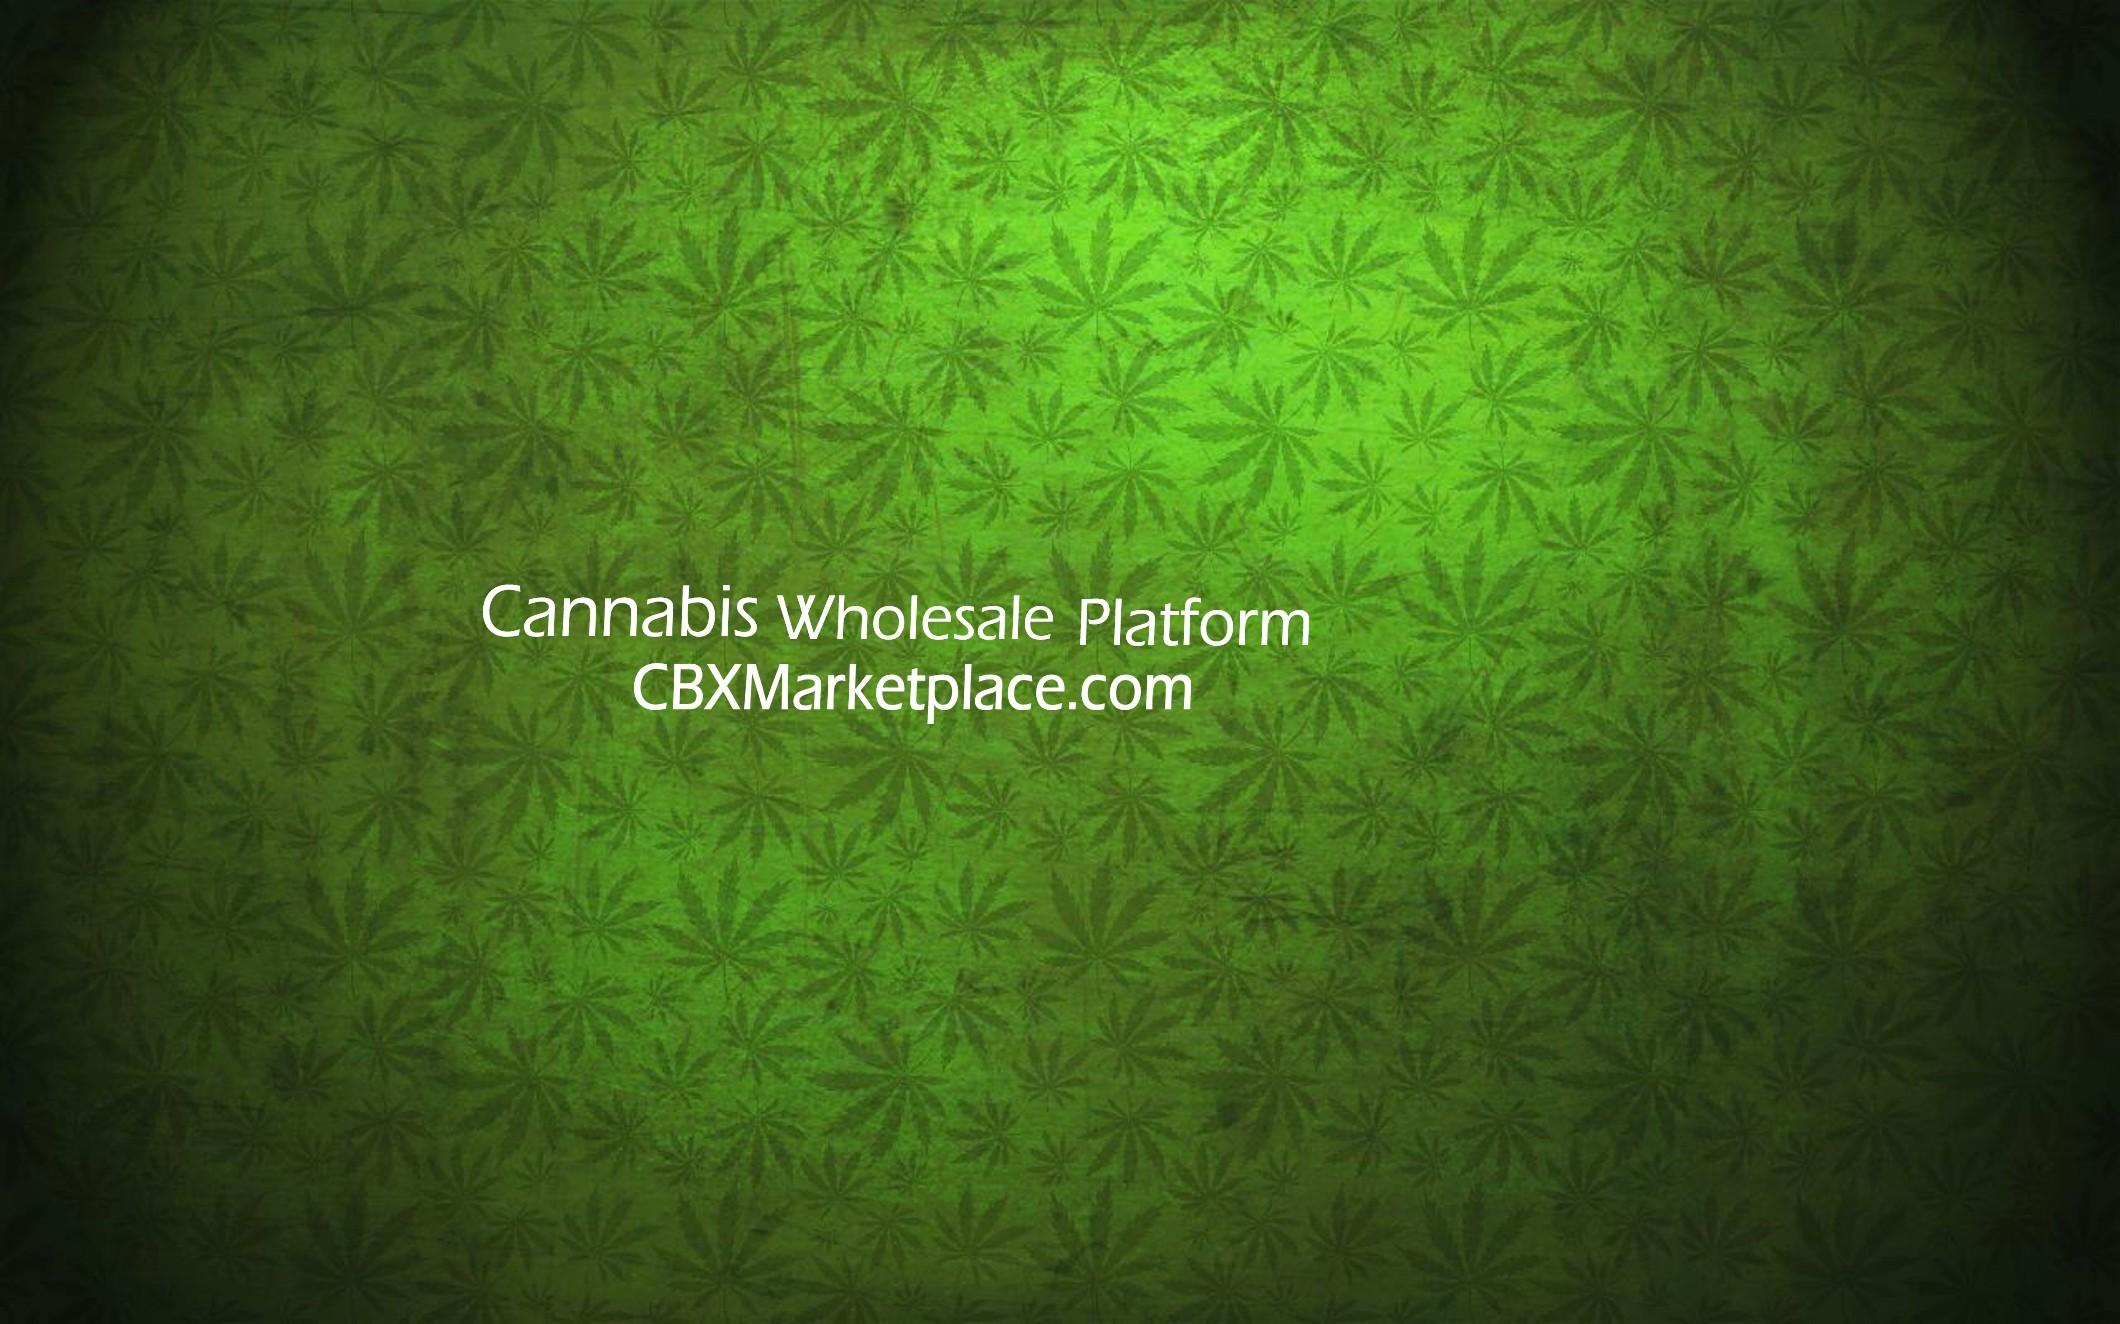 Cannabis Wholesale Platform | B2B For Growers & Retailers